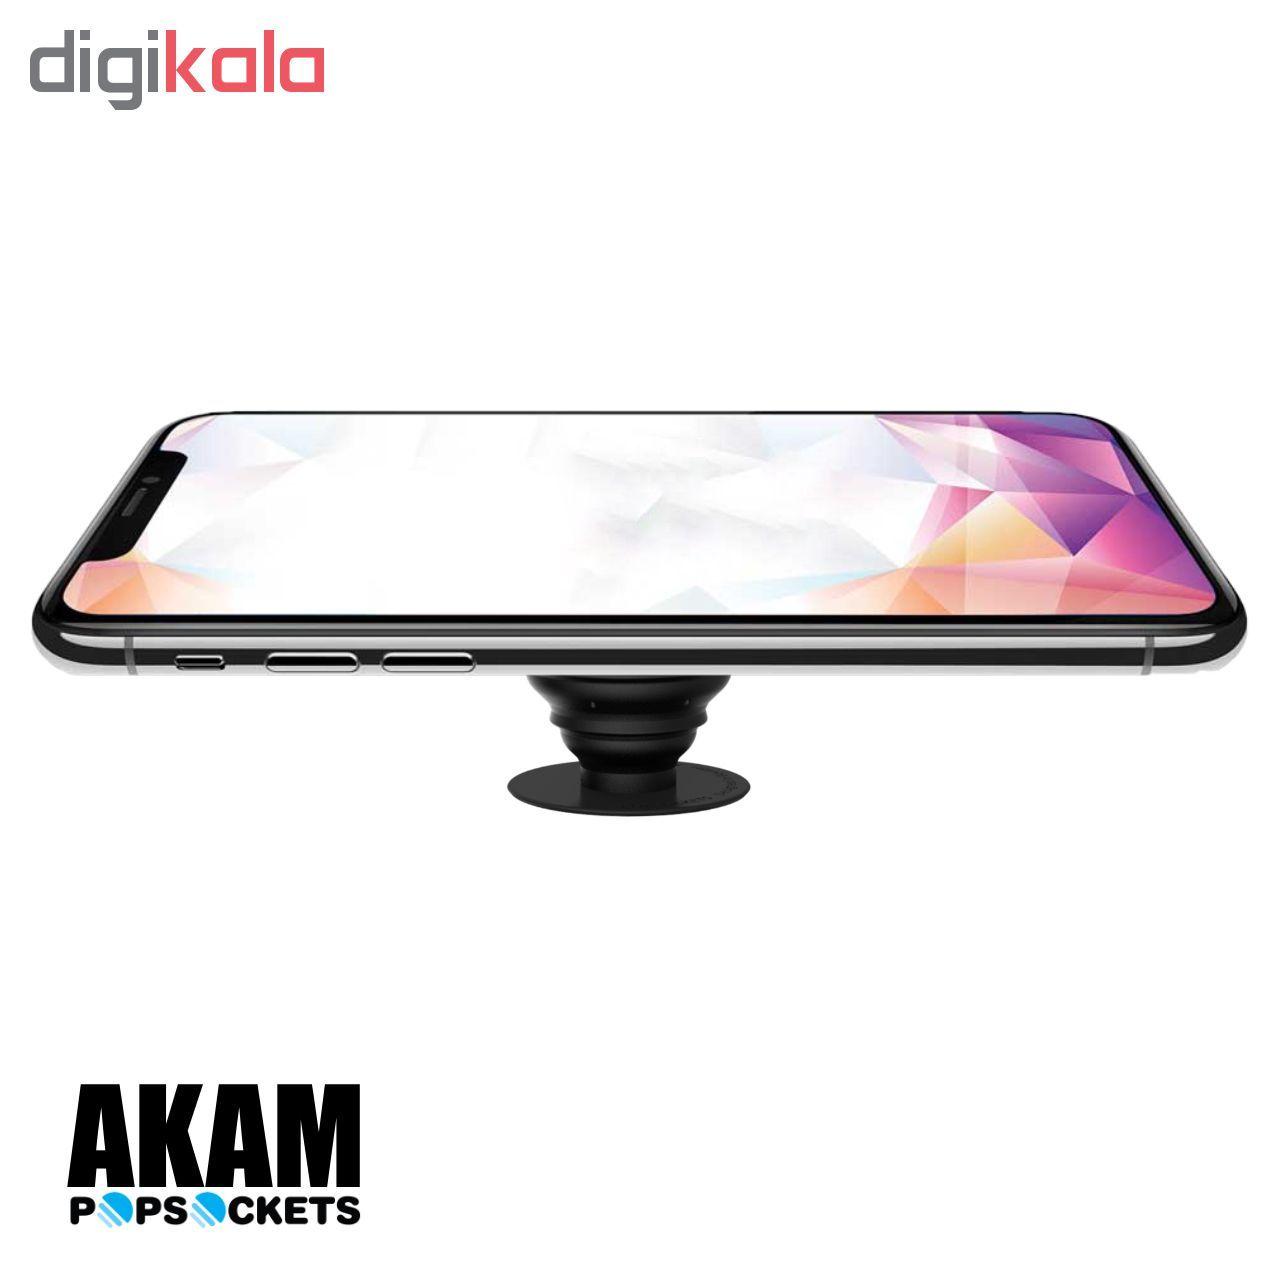 پایه نگهدارنده گوشی موبایل پاپ سوکت آکام مدل APS0068 main 1 10